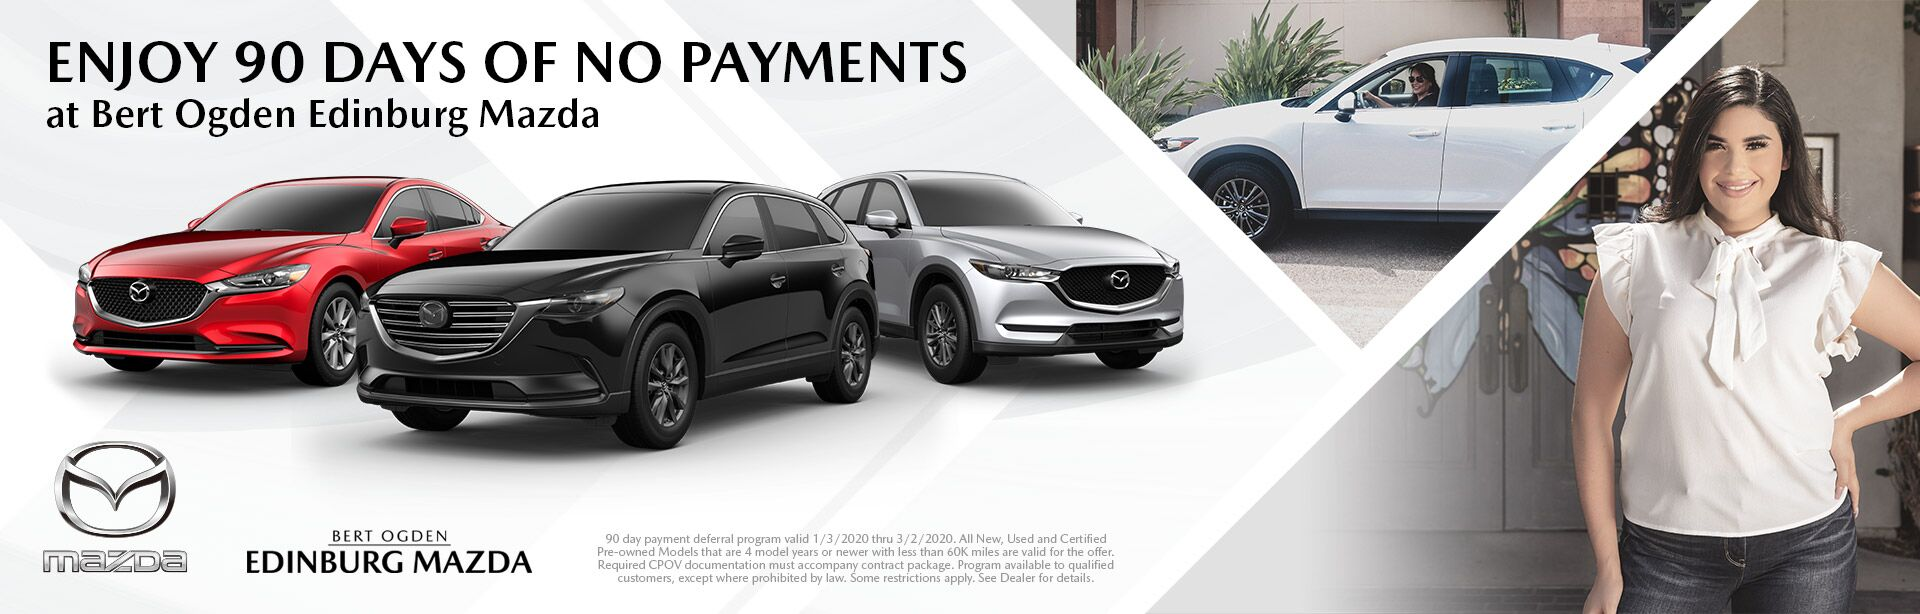 No Payments For 90 Days - Bert Ogden Edinburg Mazda - Edinburg, TX